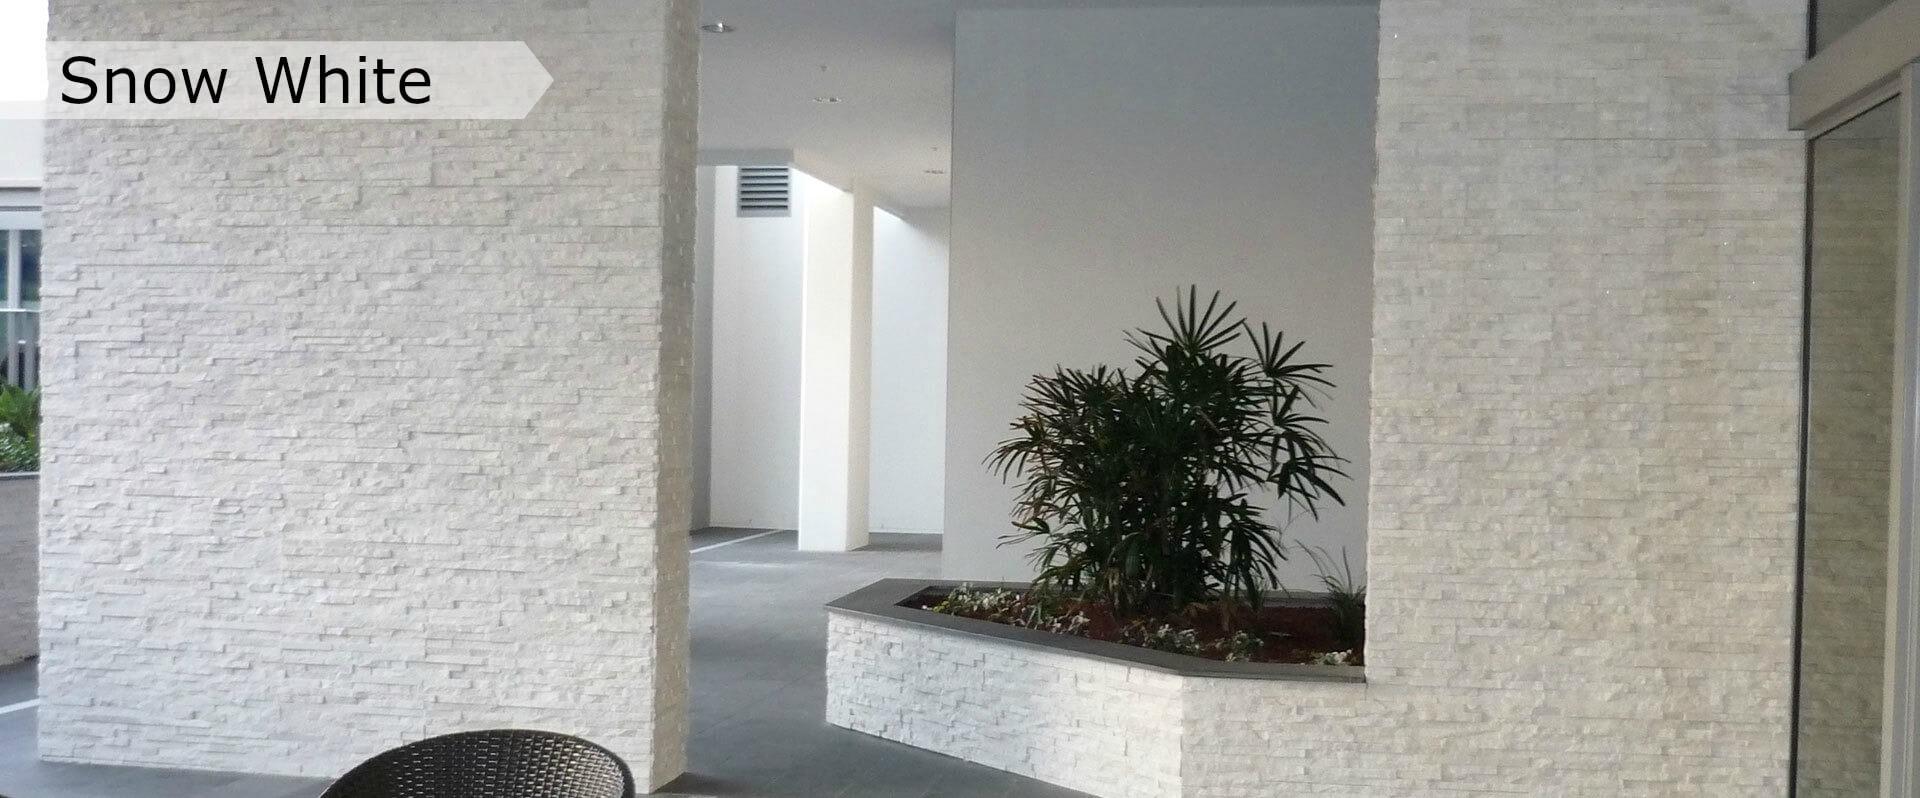 Fireplace Natural Stone Tiles